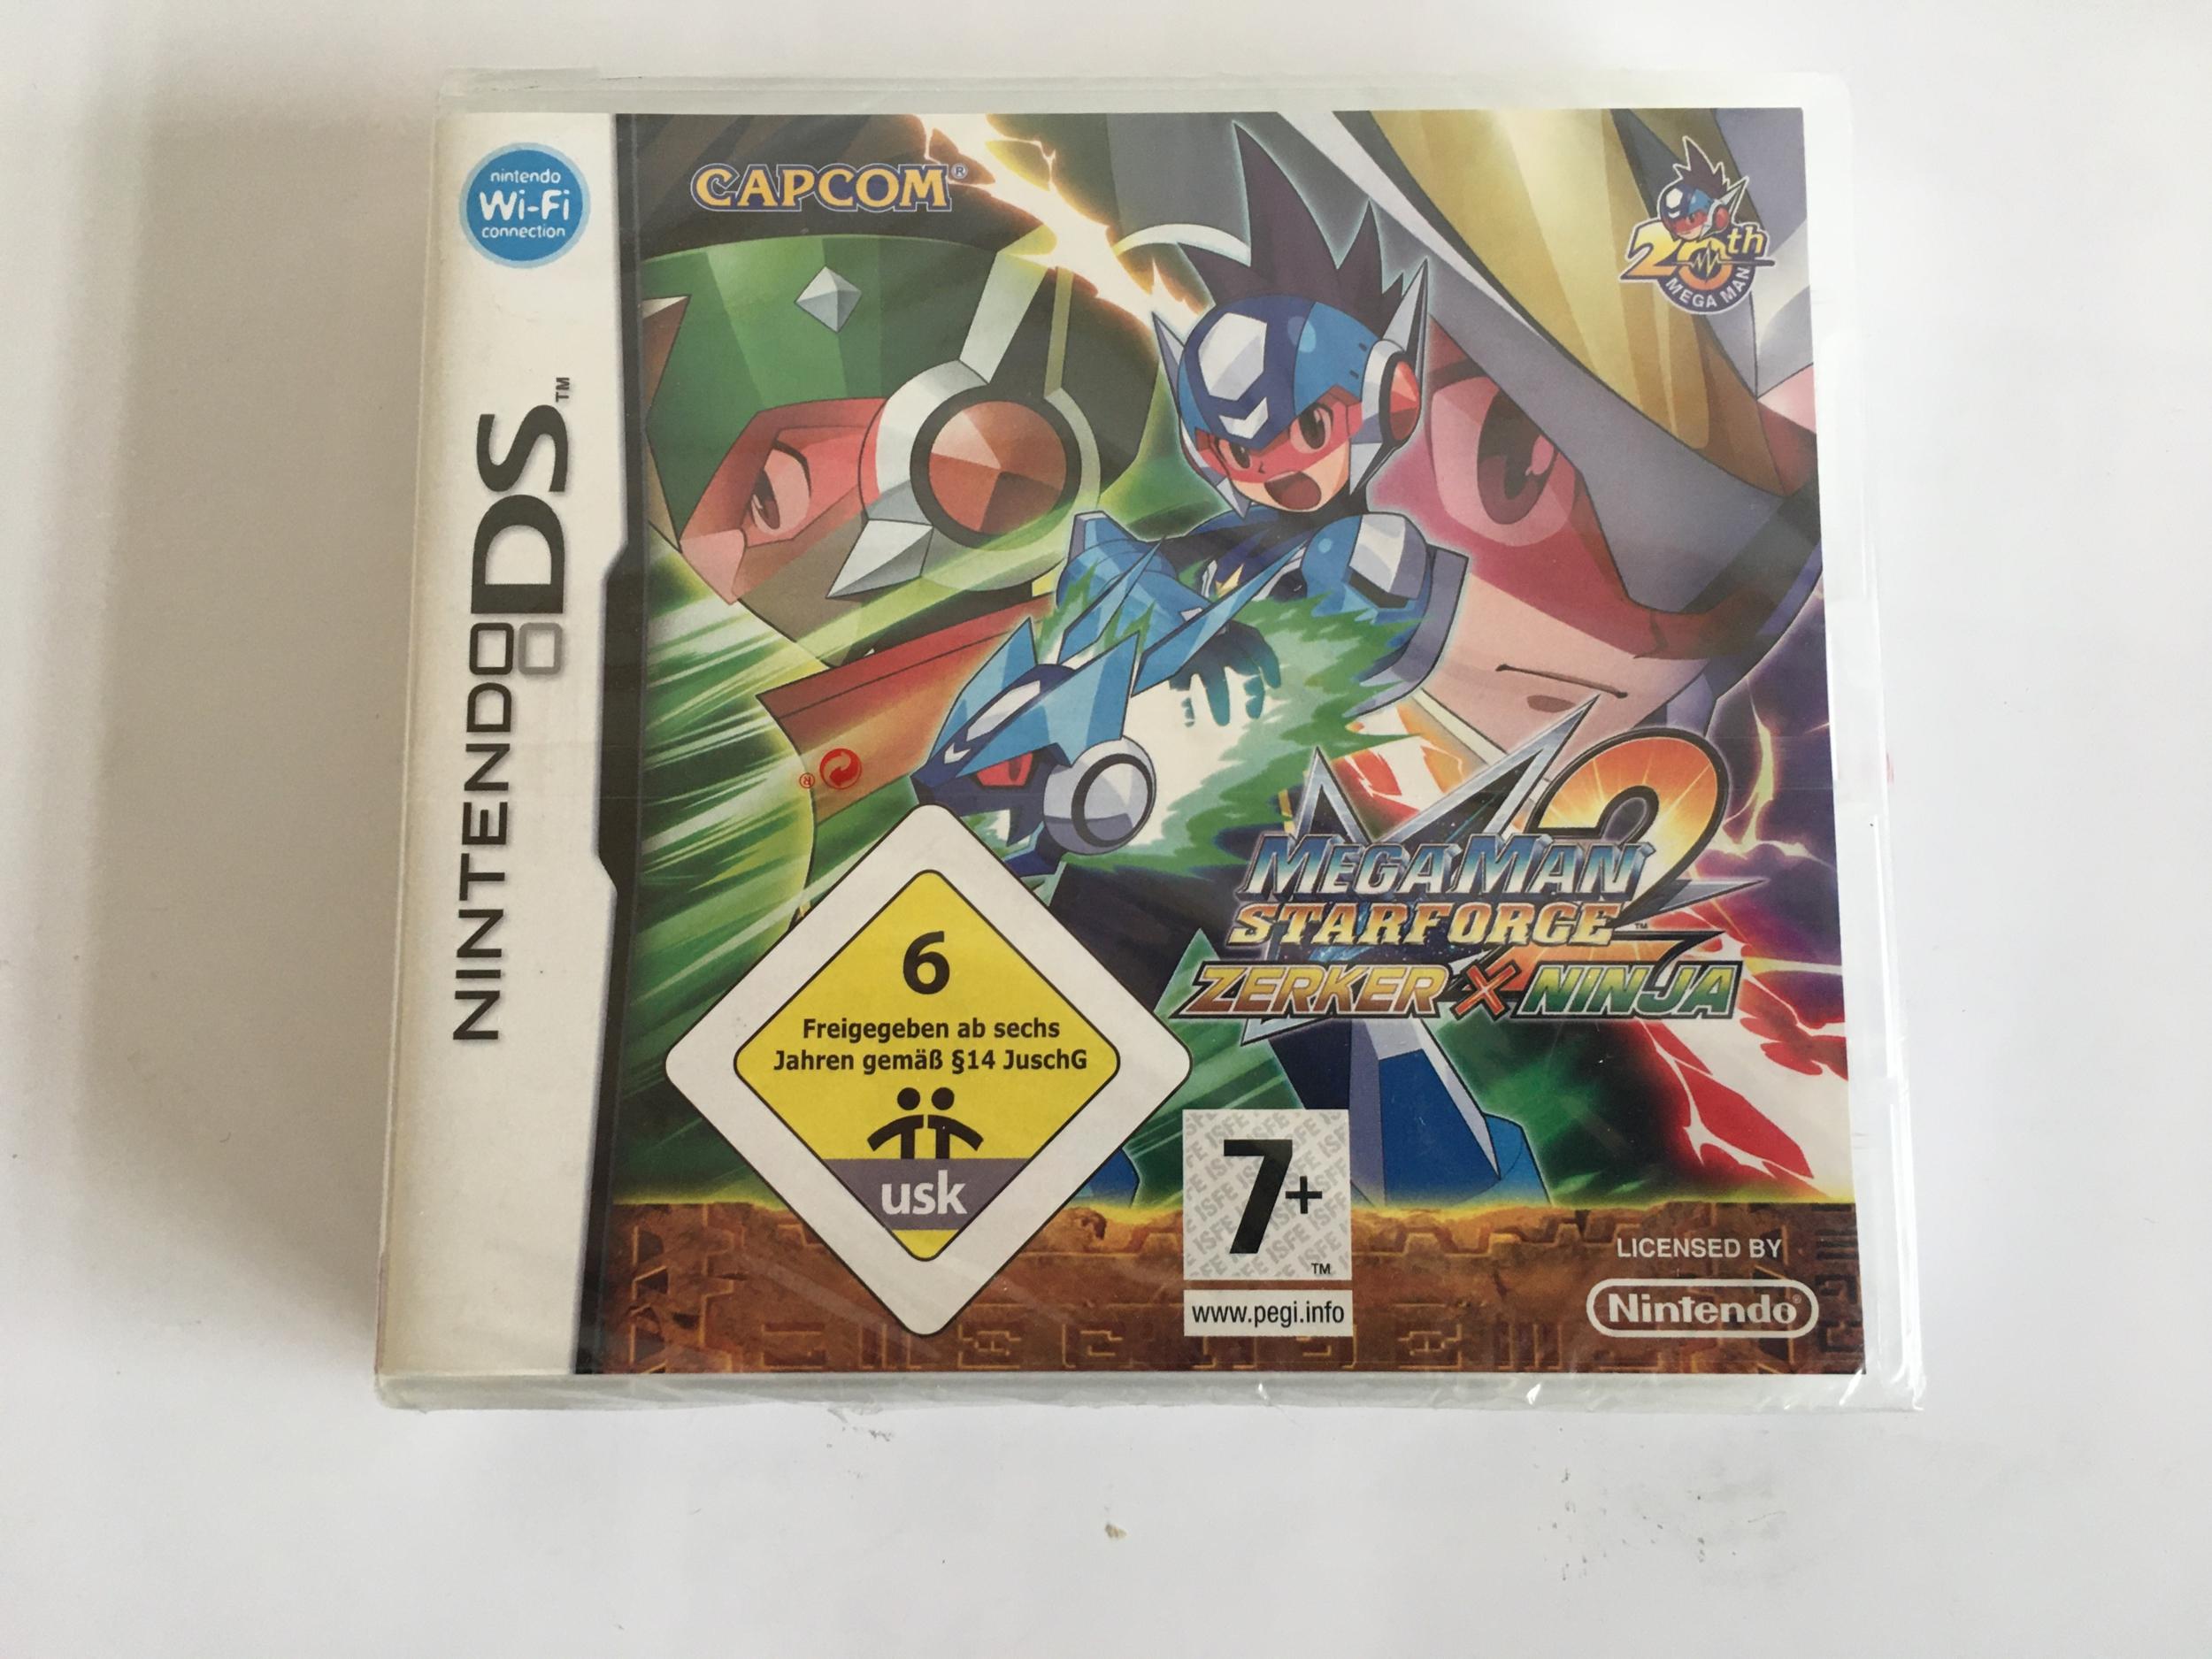 Megaman Star Force 2 Zerker X Ninja Nintendo DS